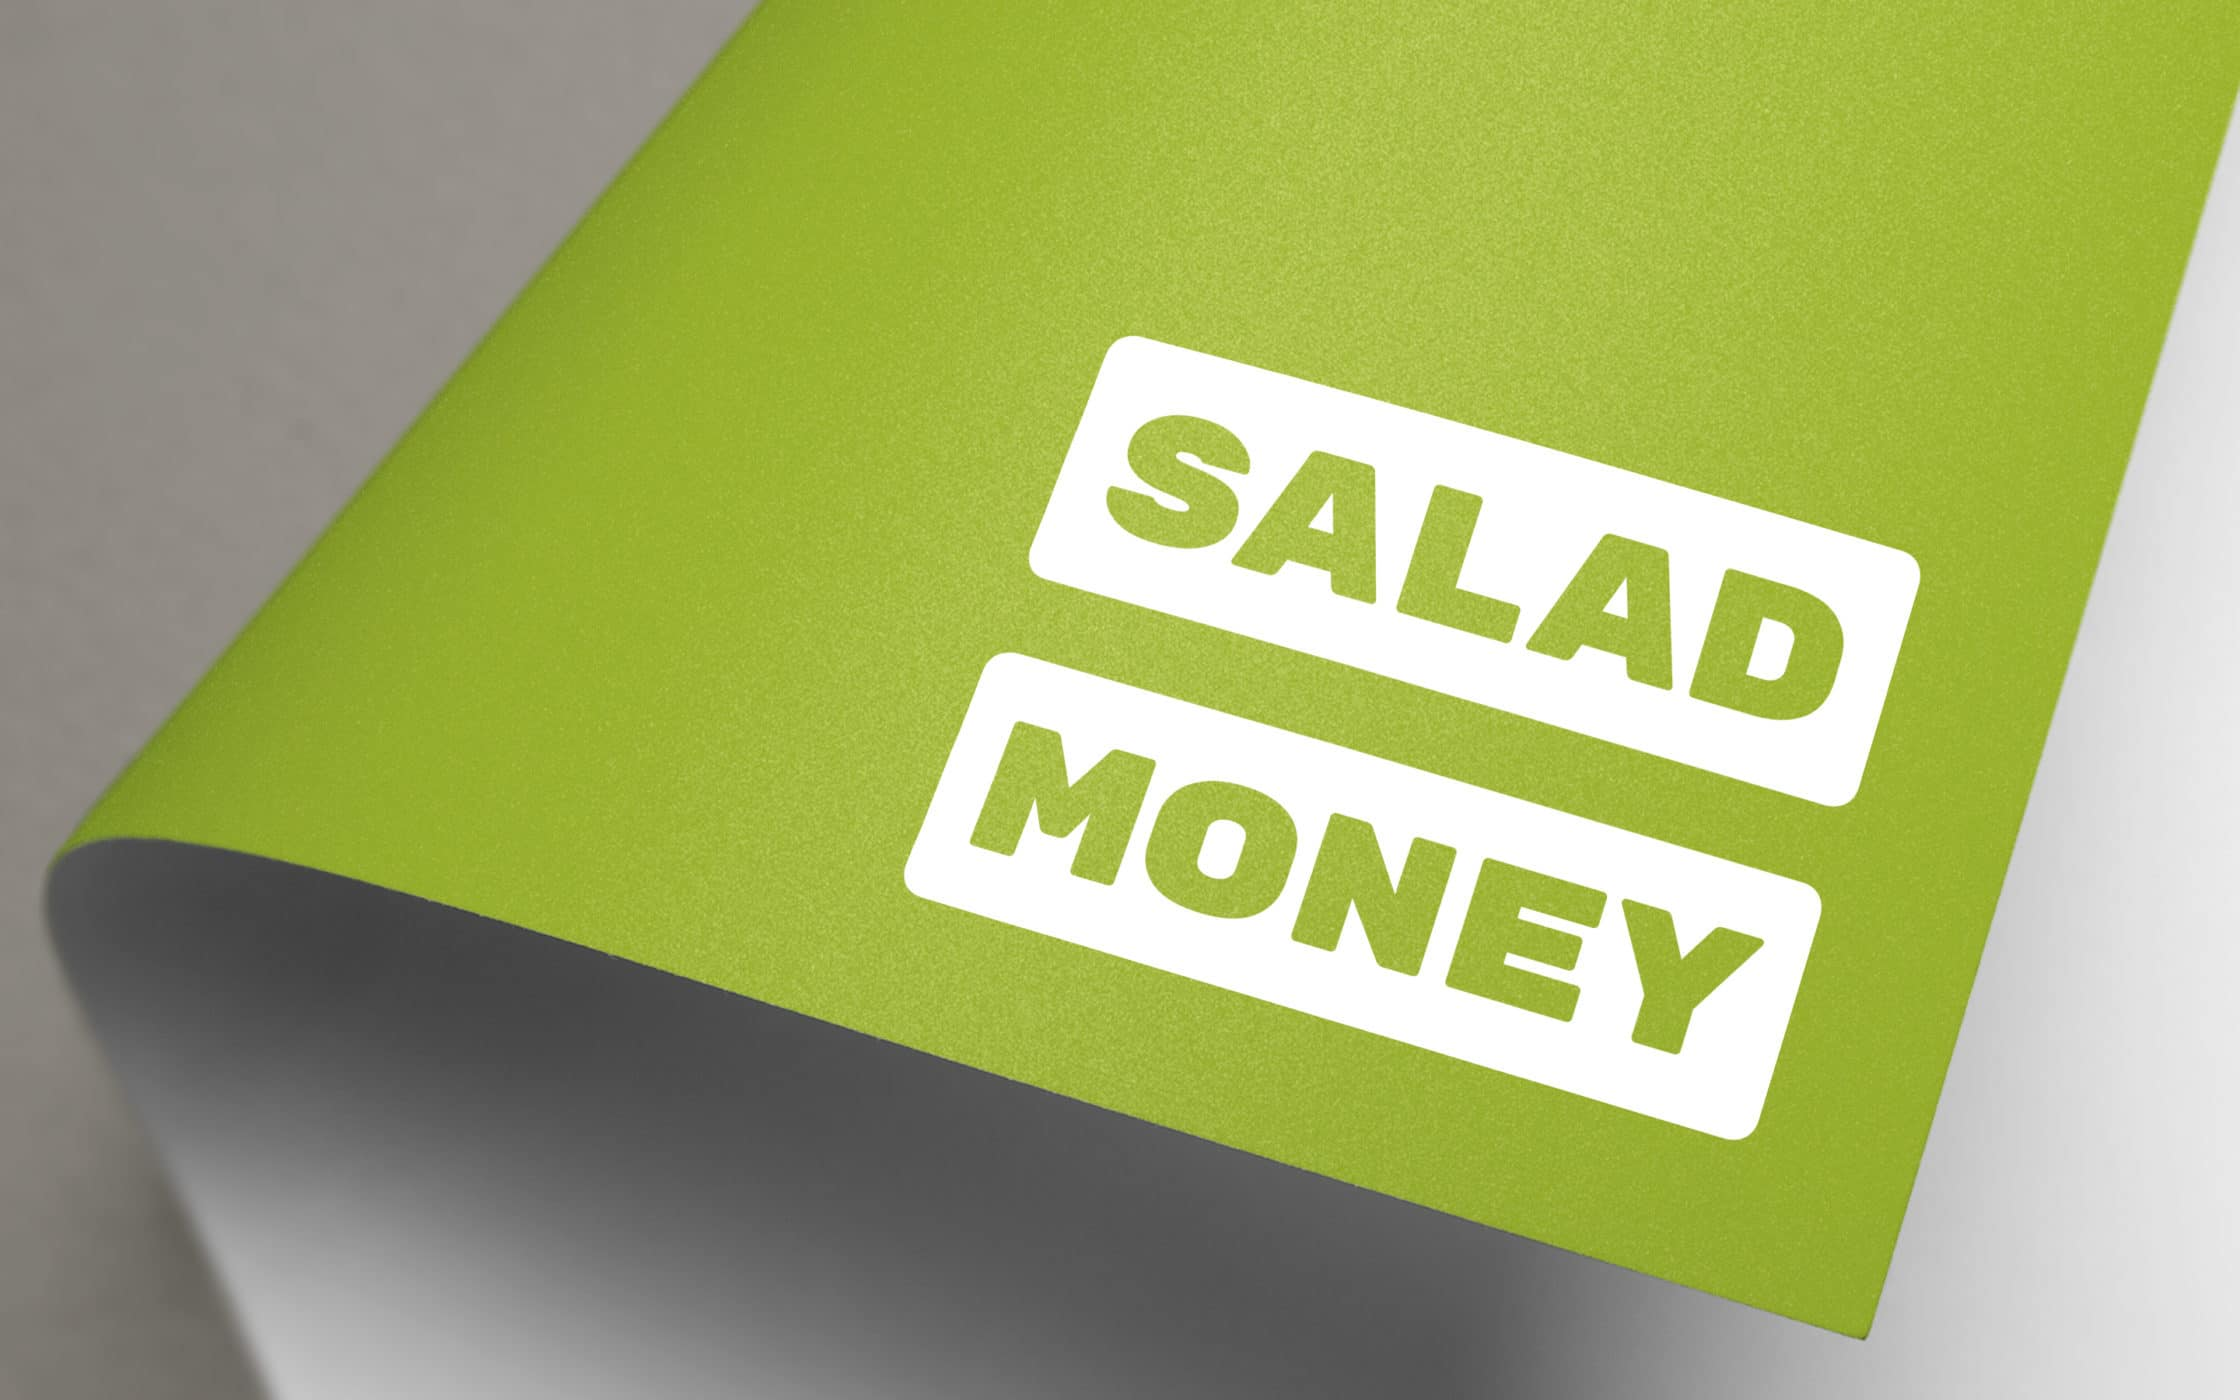 Salad Money